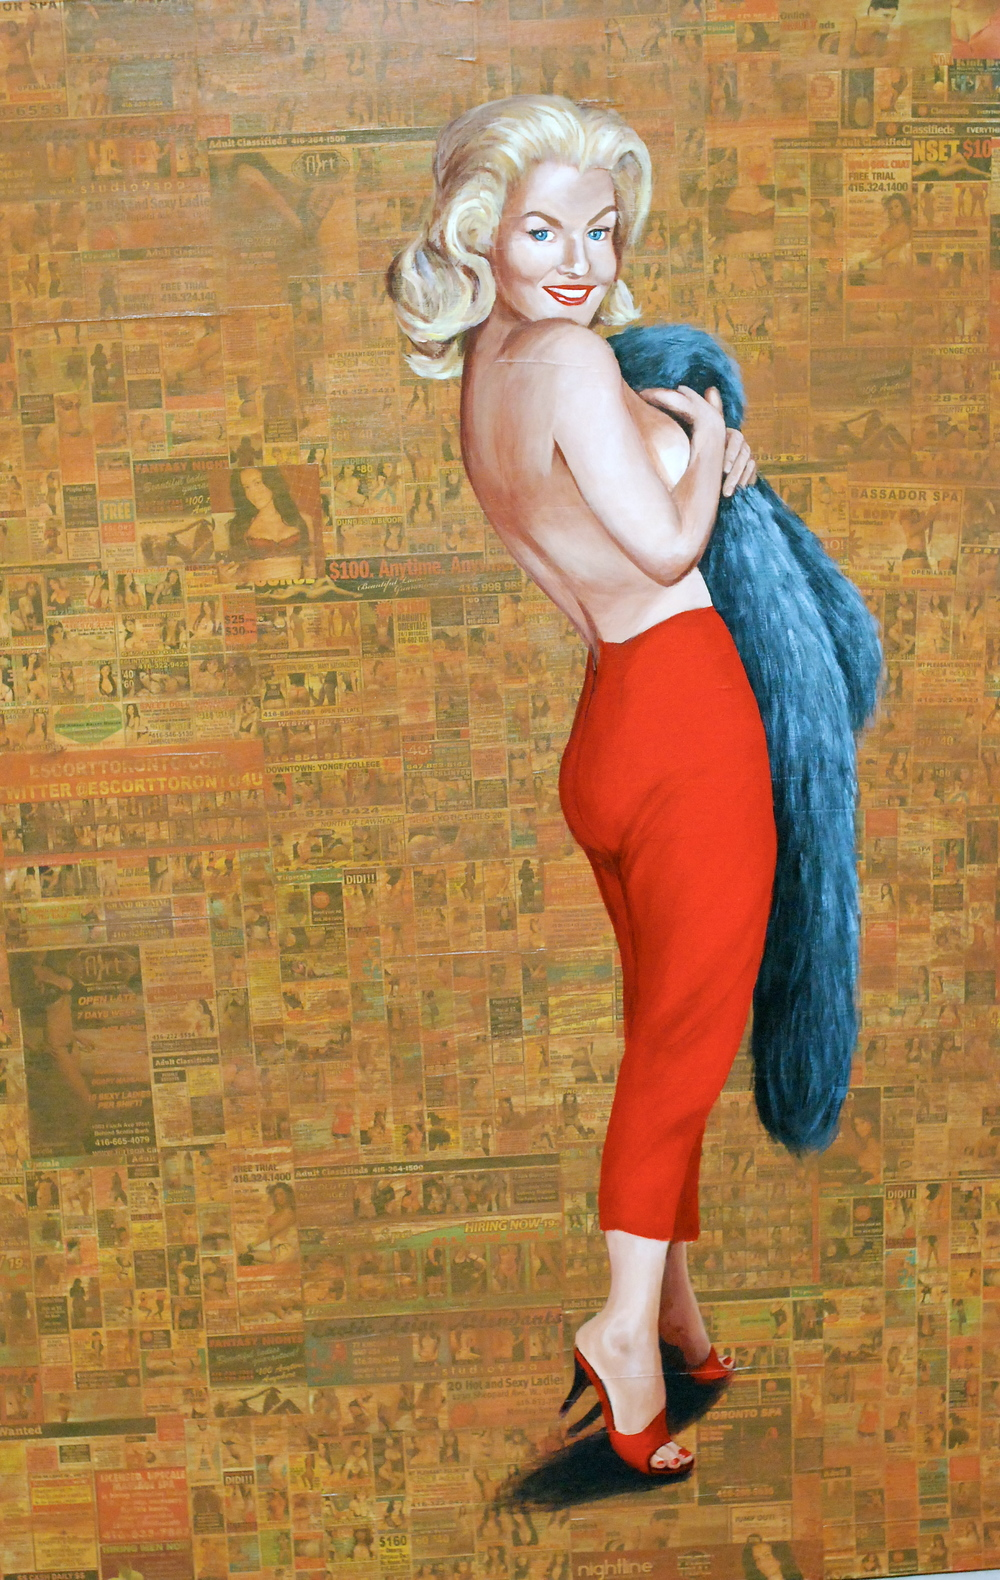 Miss October Sheehan 1958